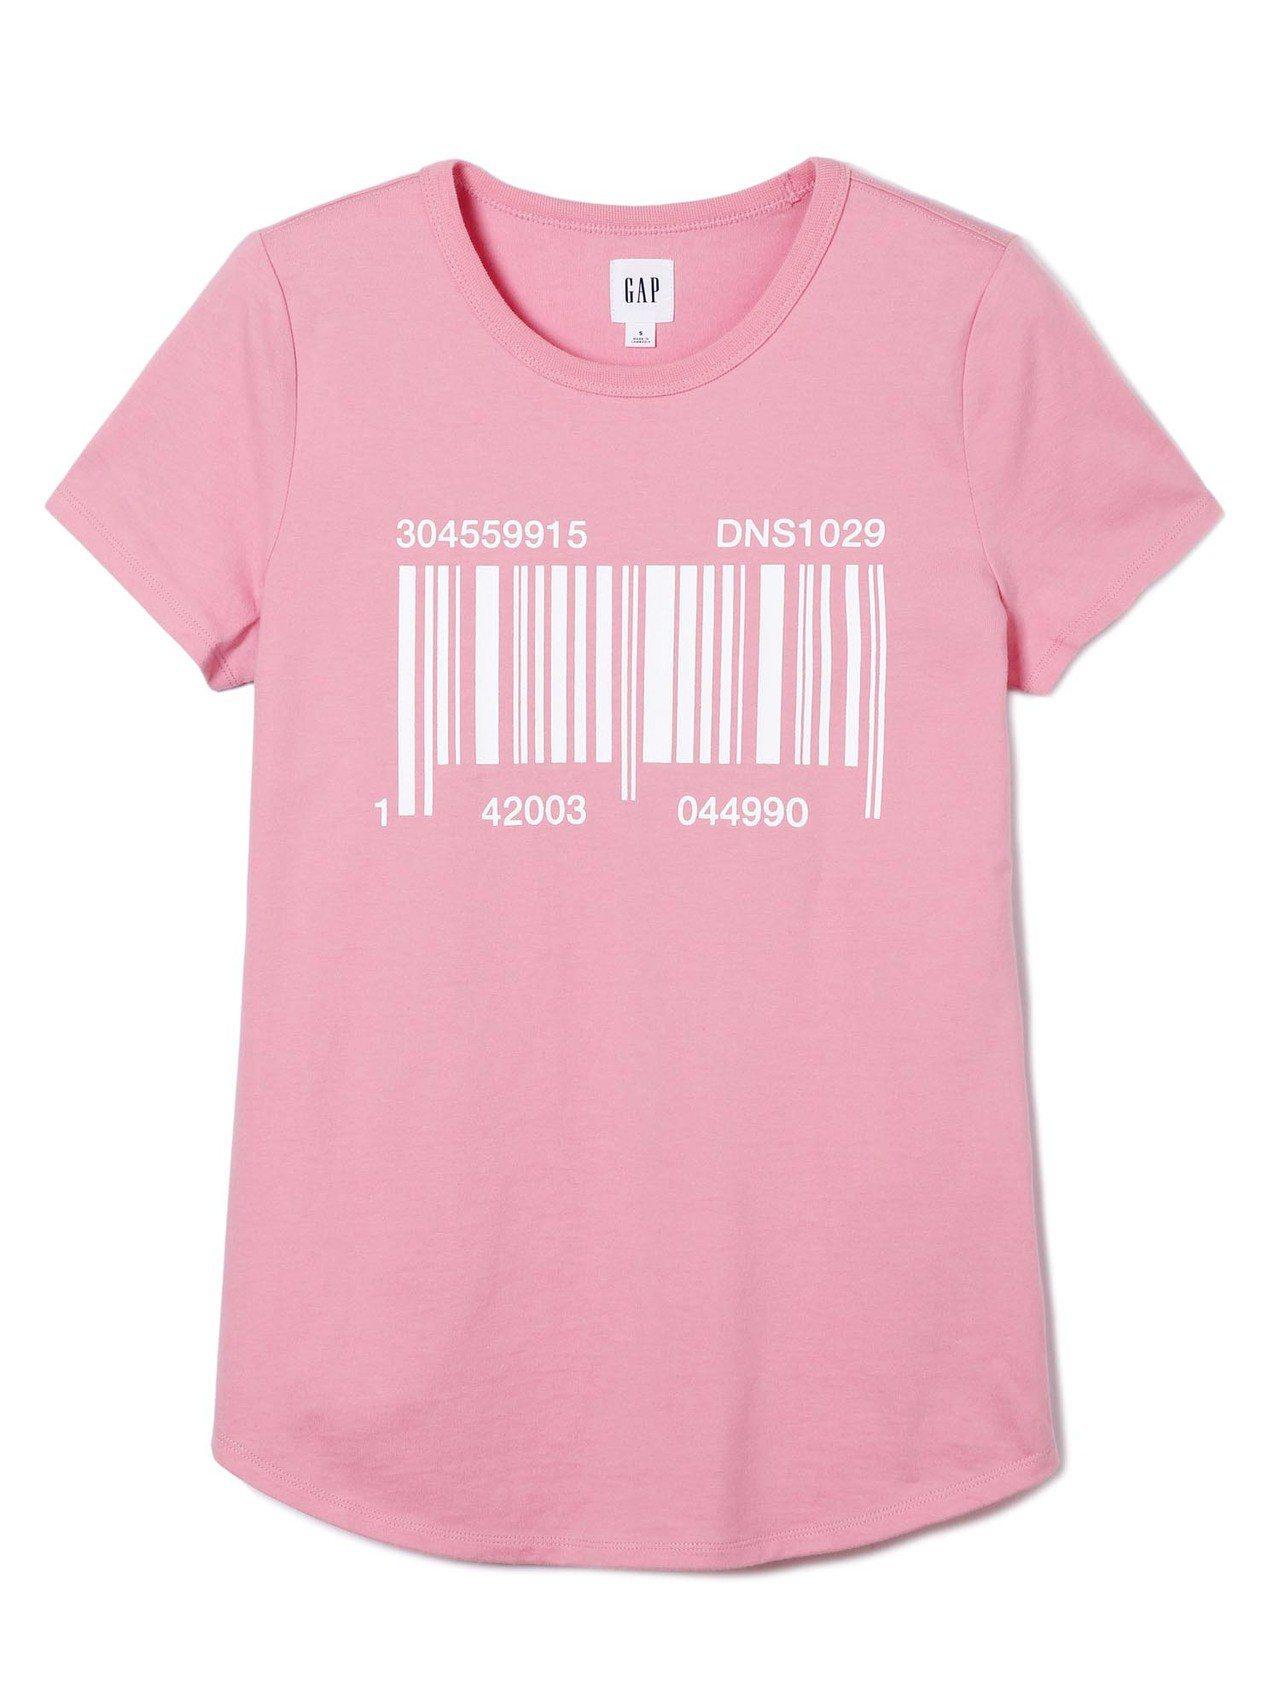 GAP與Constance Tsui聯名系列創意印花圓領短袖T恤,約999元。